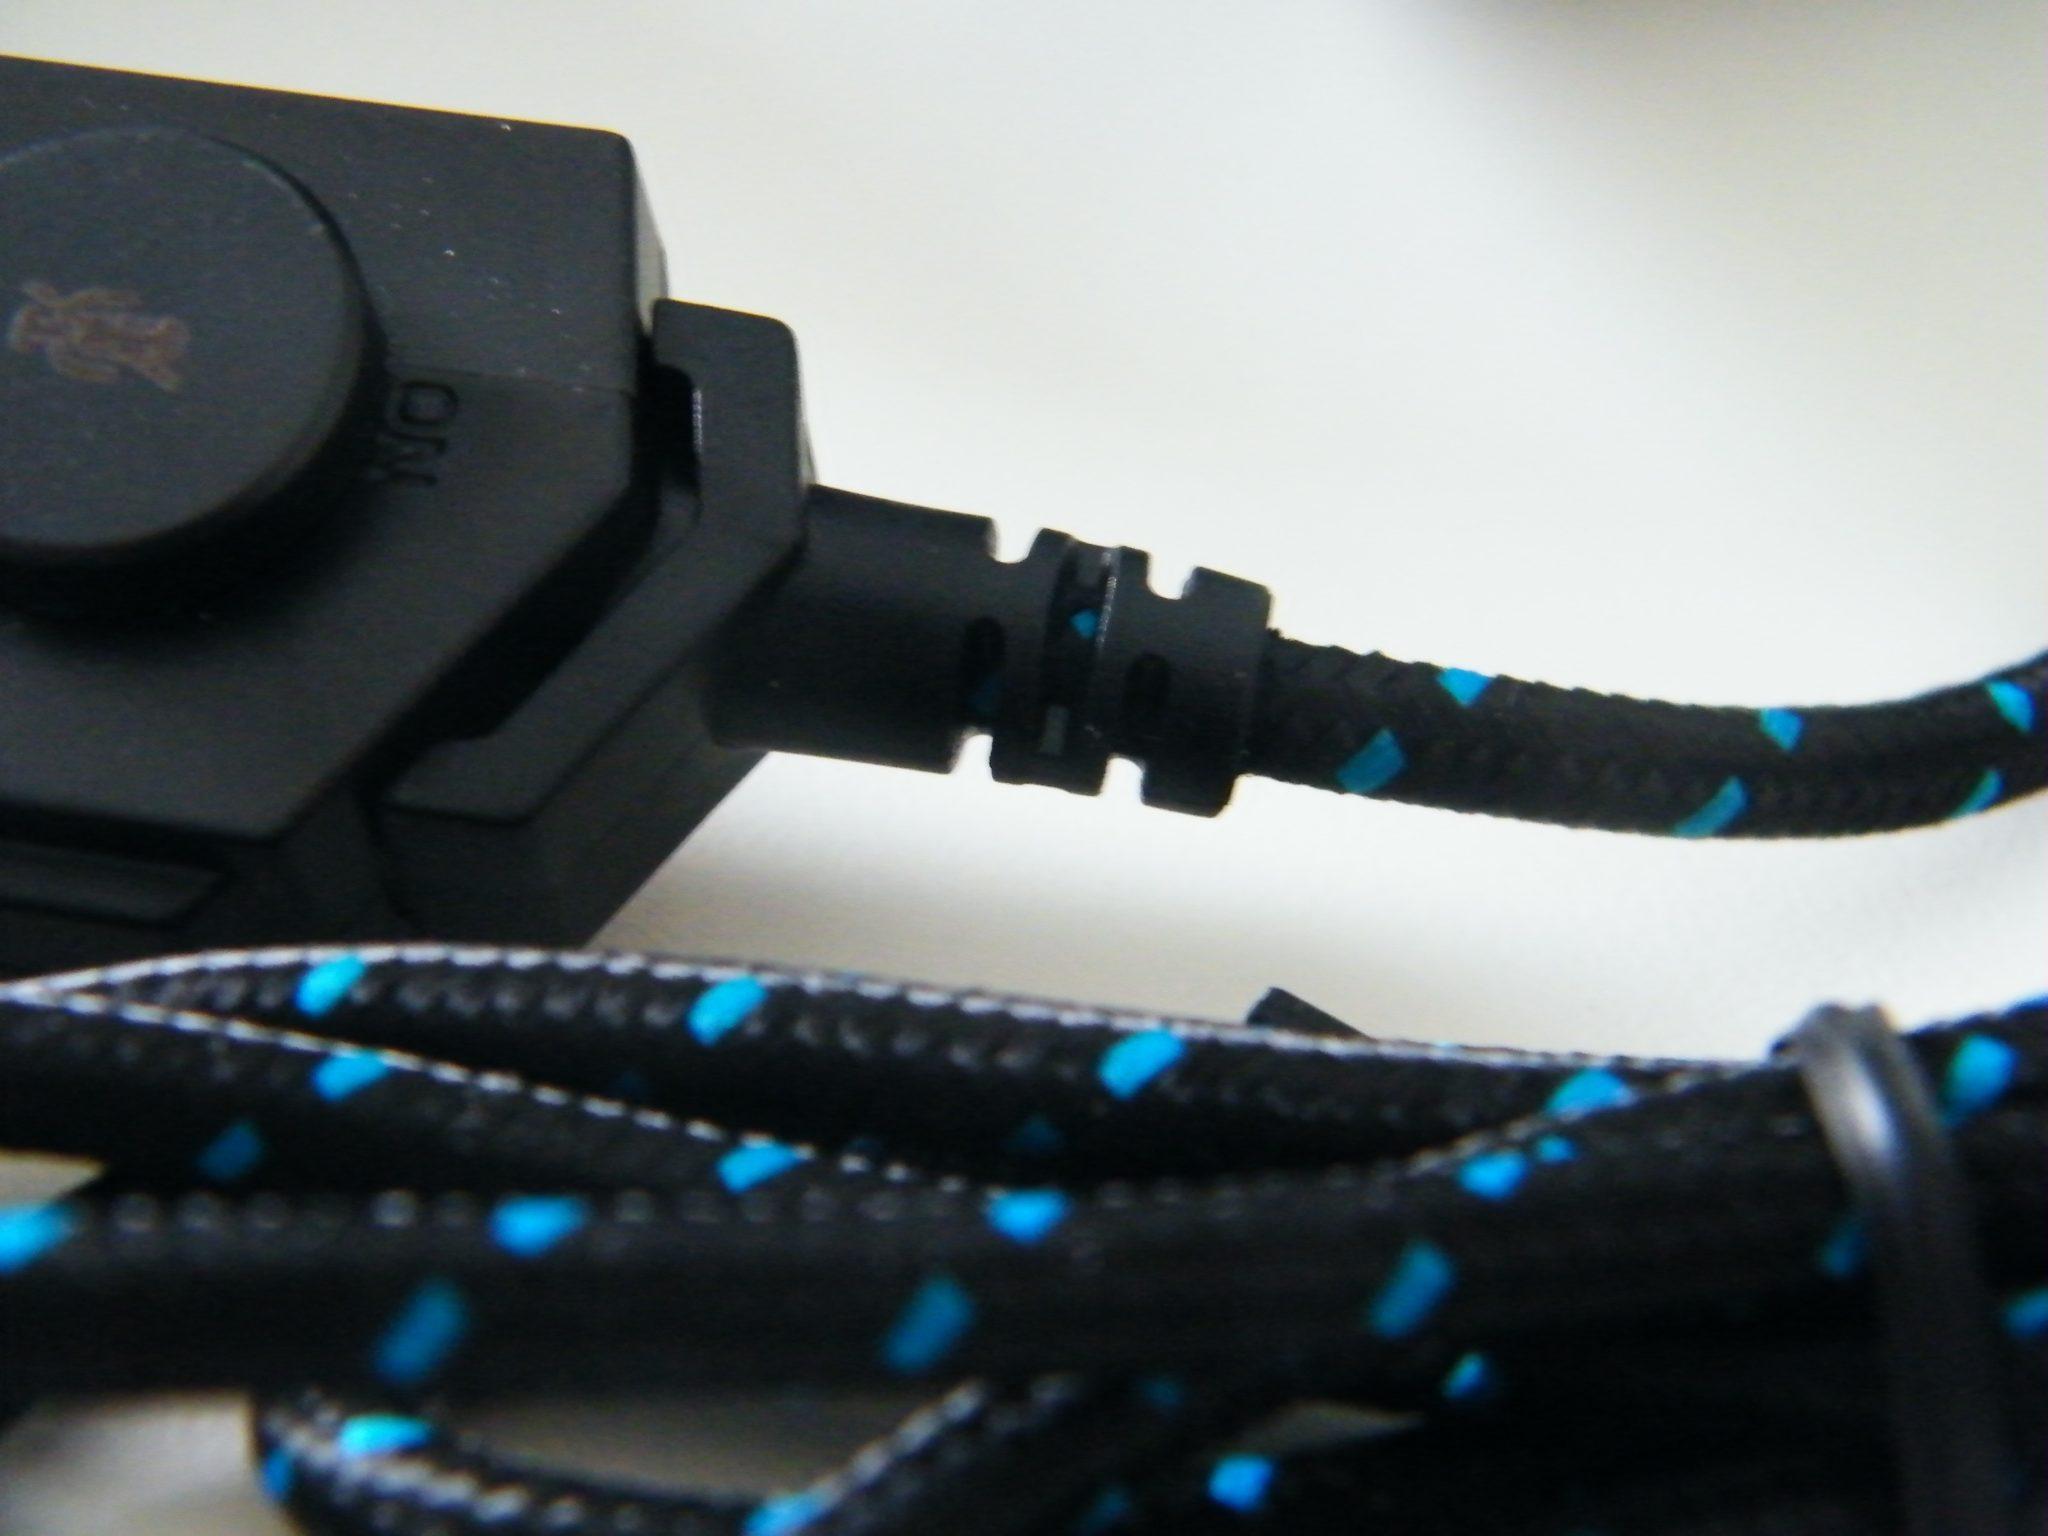 EasySMX K5 Dettaglio cavo